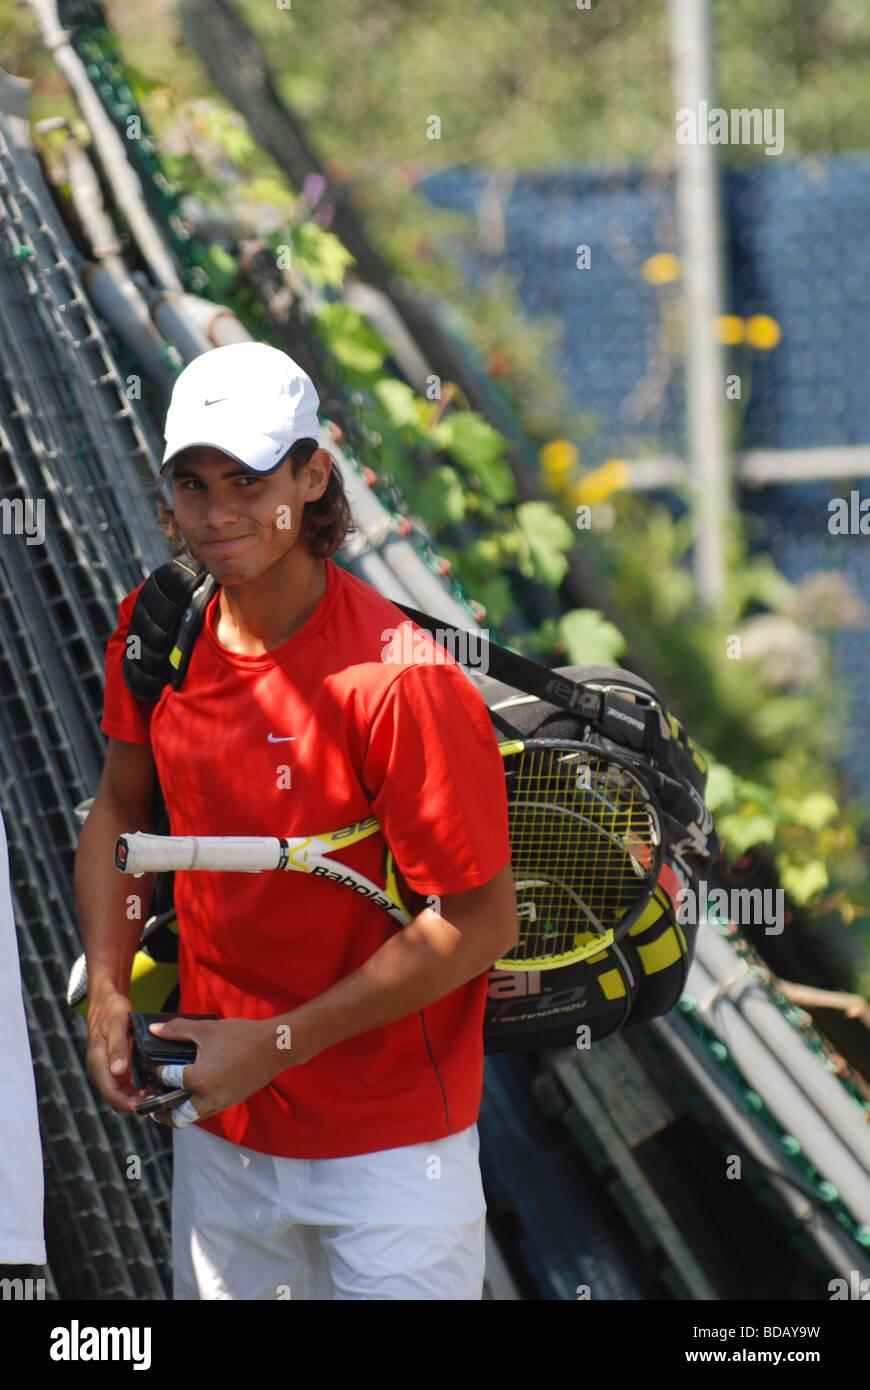 Rafael Nadal - professional tennis player - Stock Image